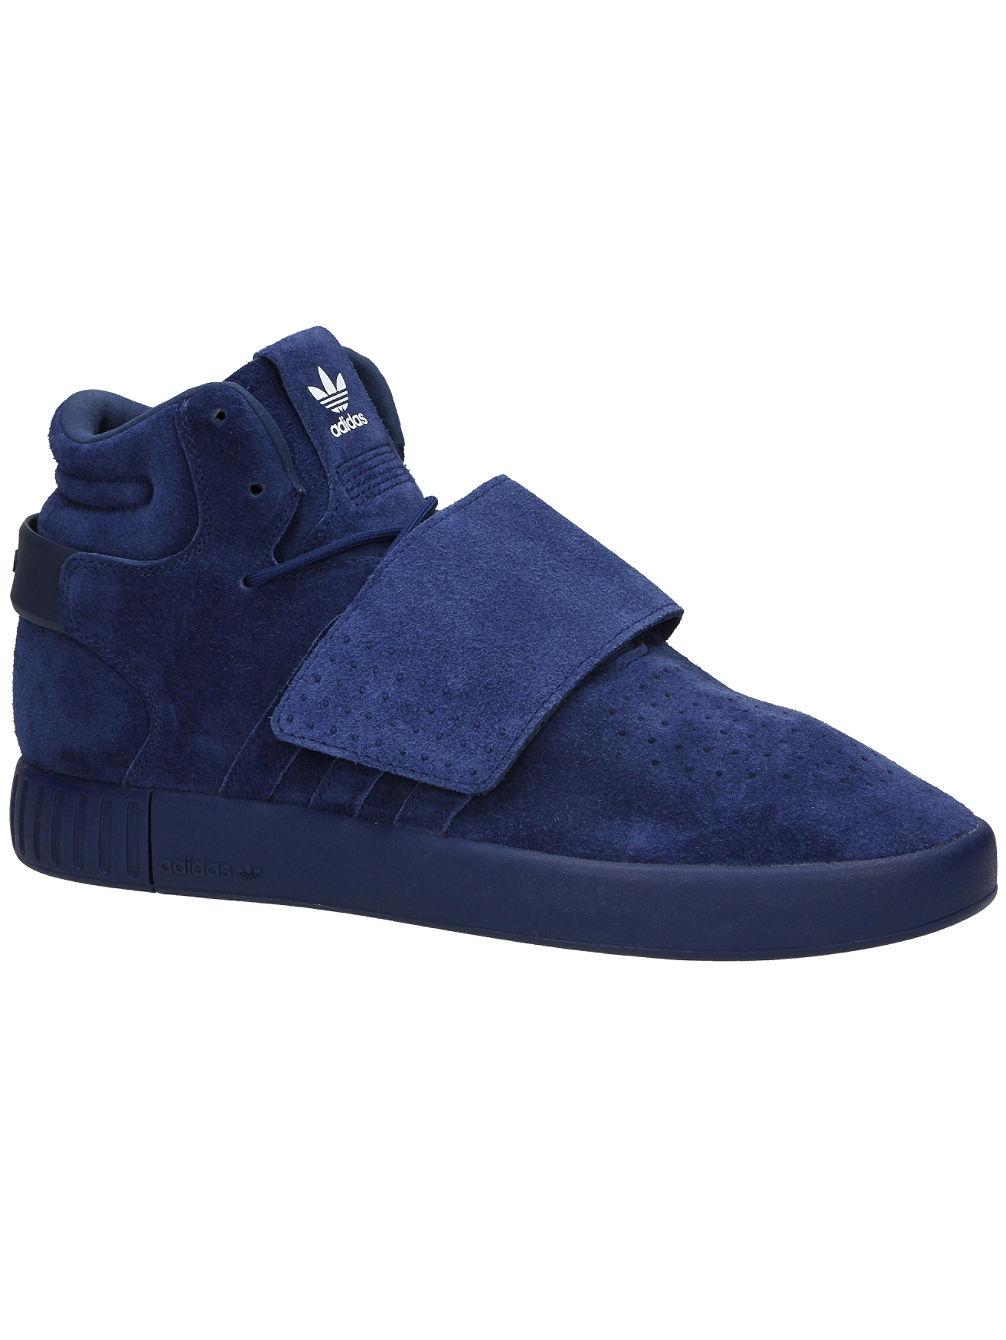 adidas-originals-tubular-invader-strap-sneakers